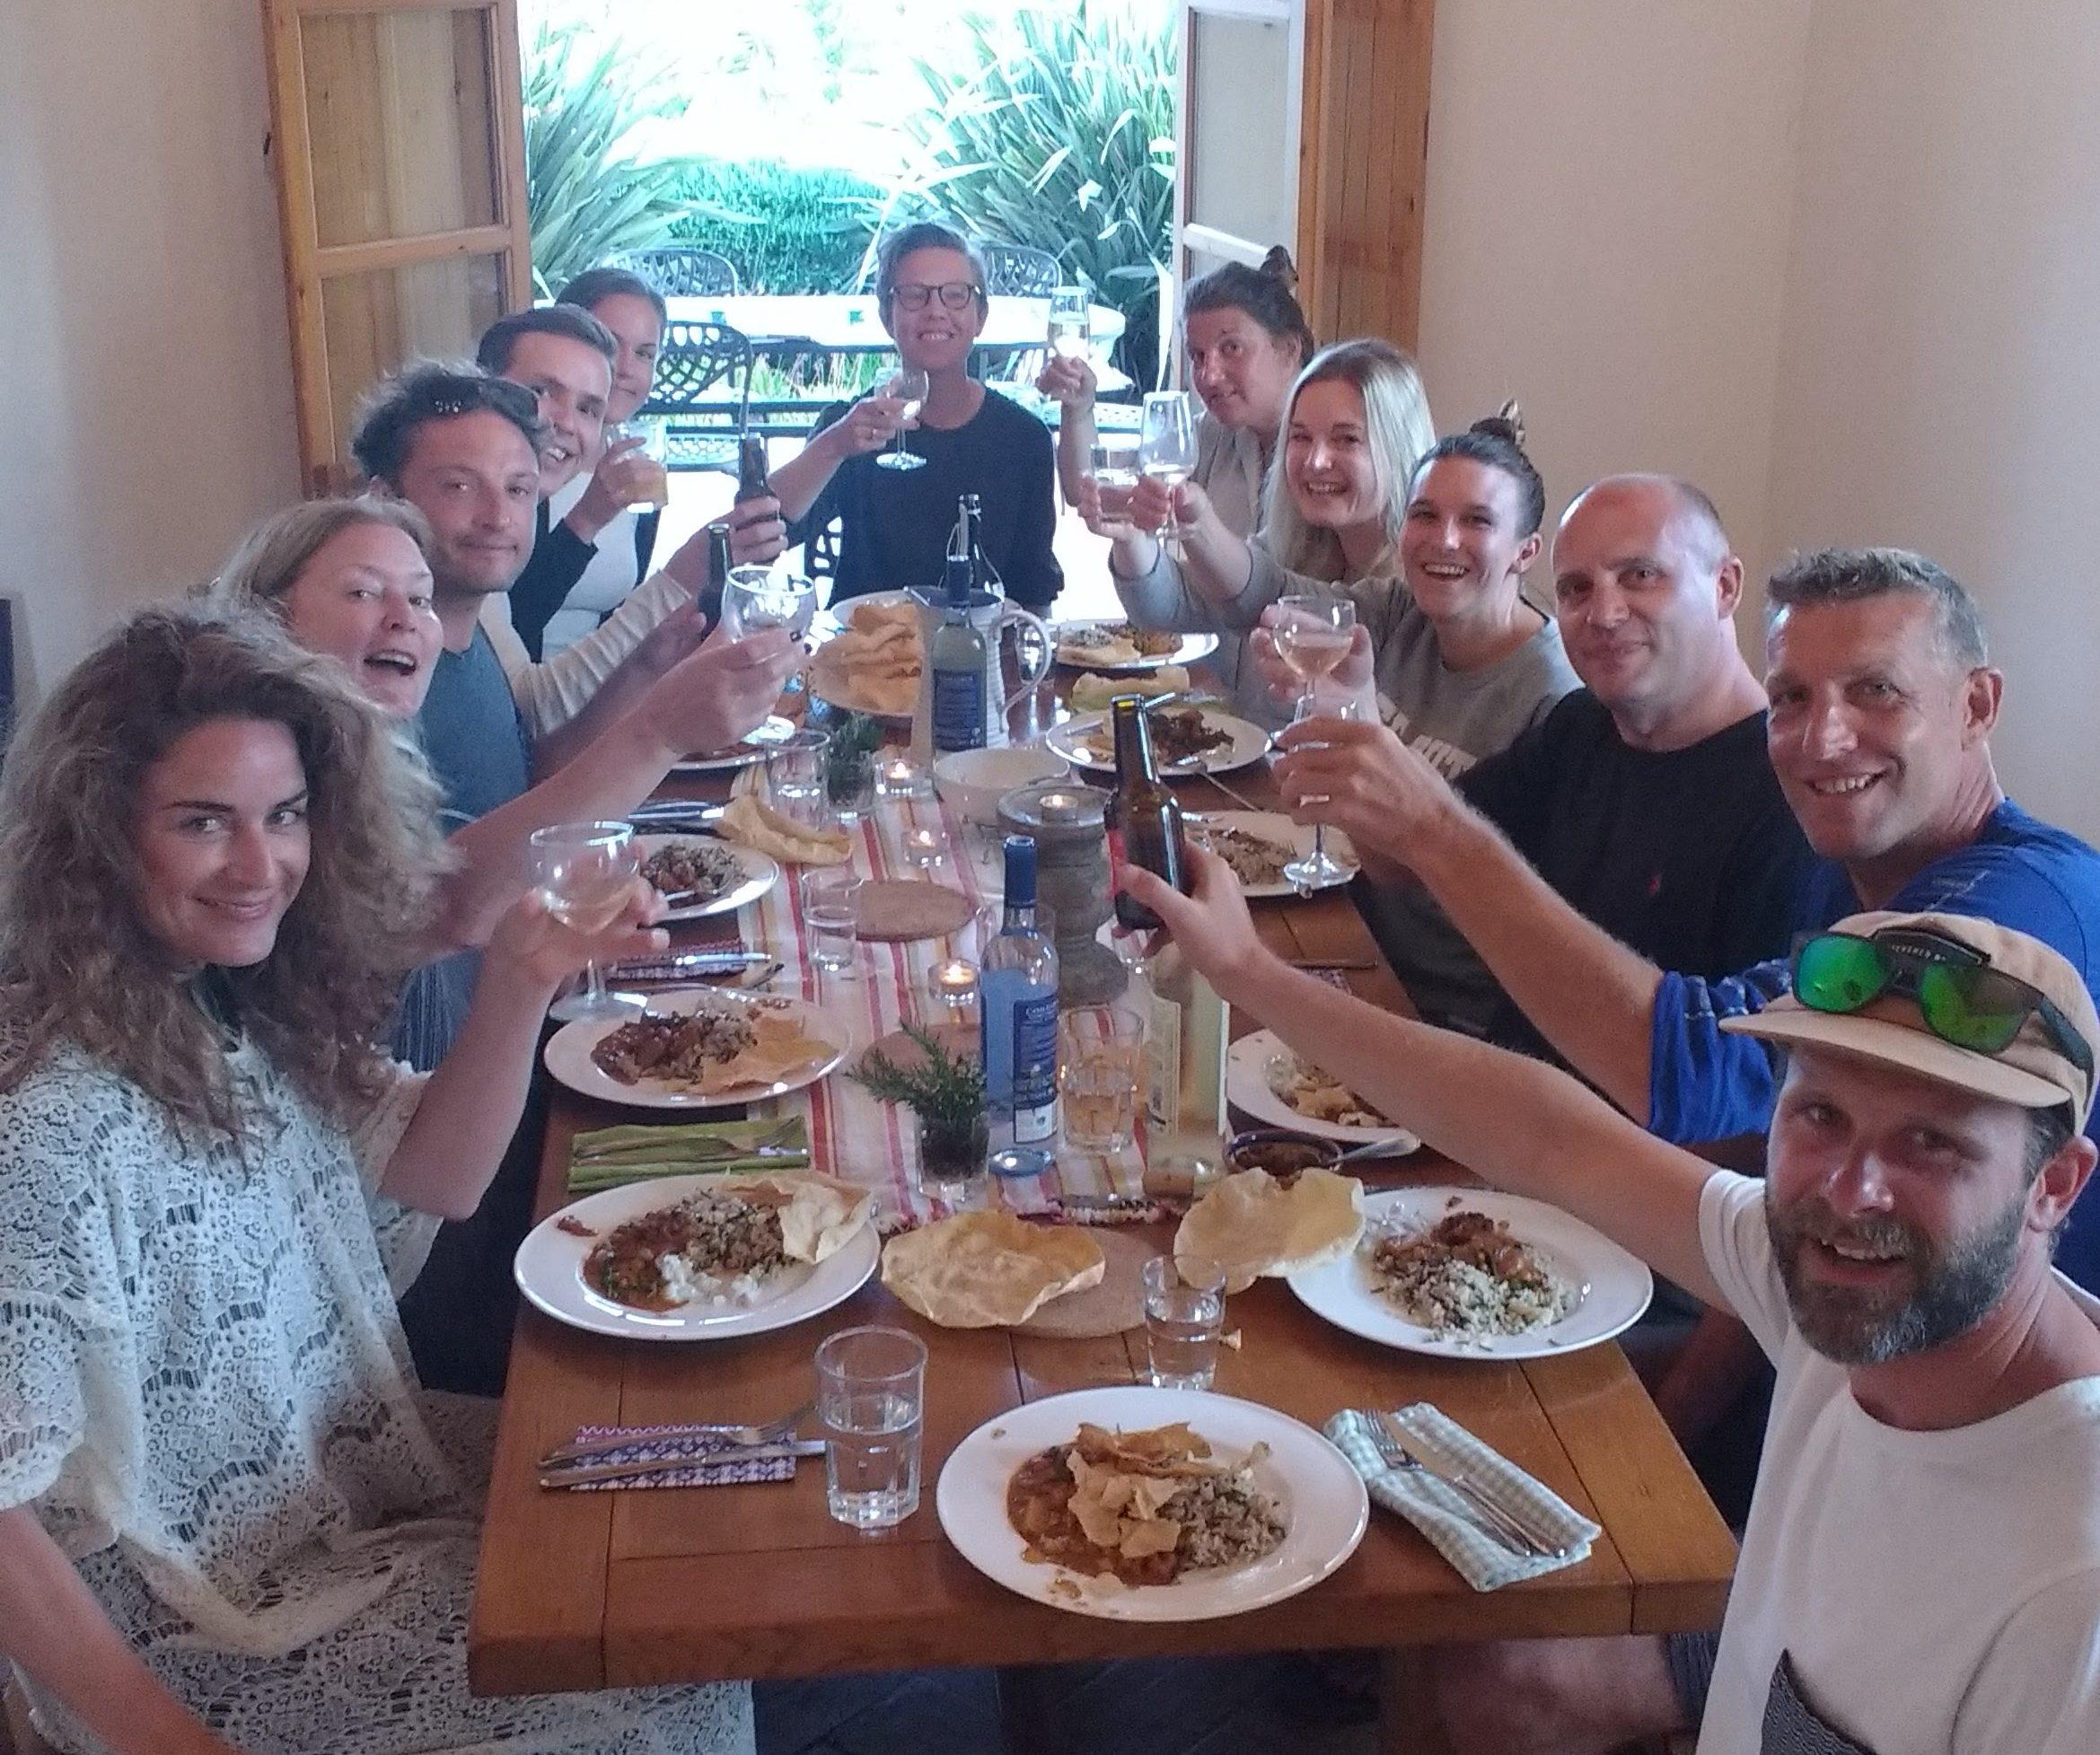 surf yoga portugal retreat saltwater yoga waves soul healthy food vegetarian